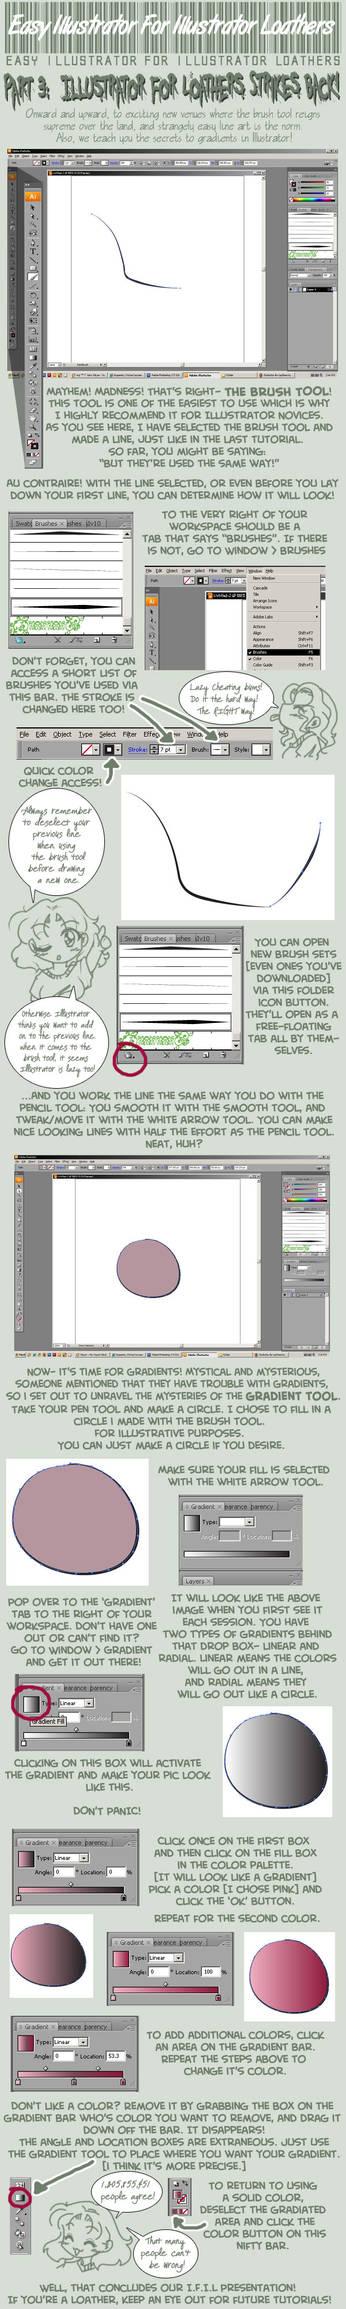 Illustrator for Loathers Pt.3